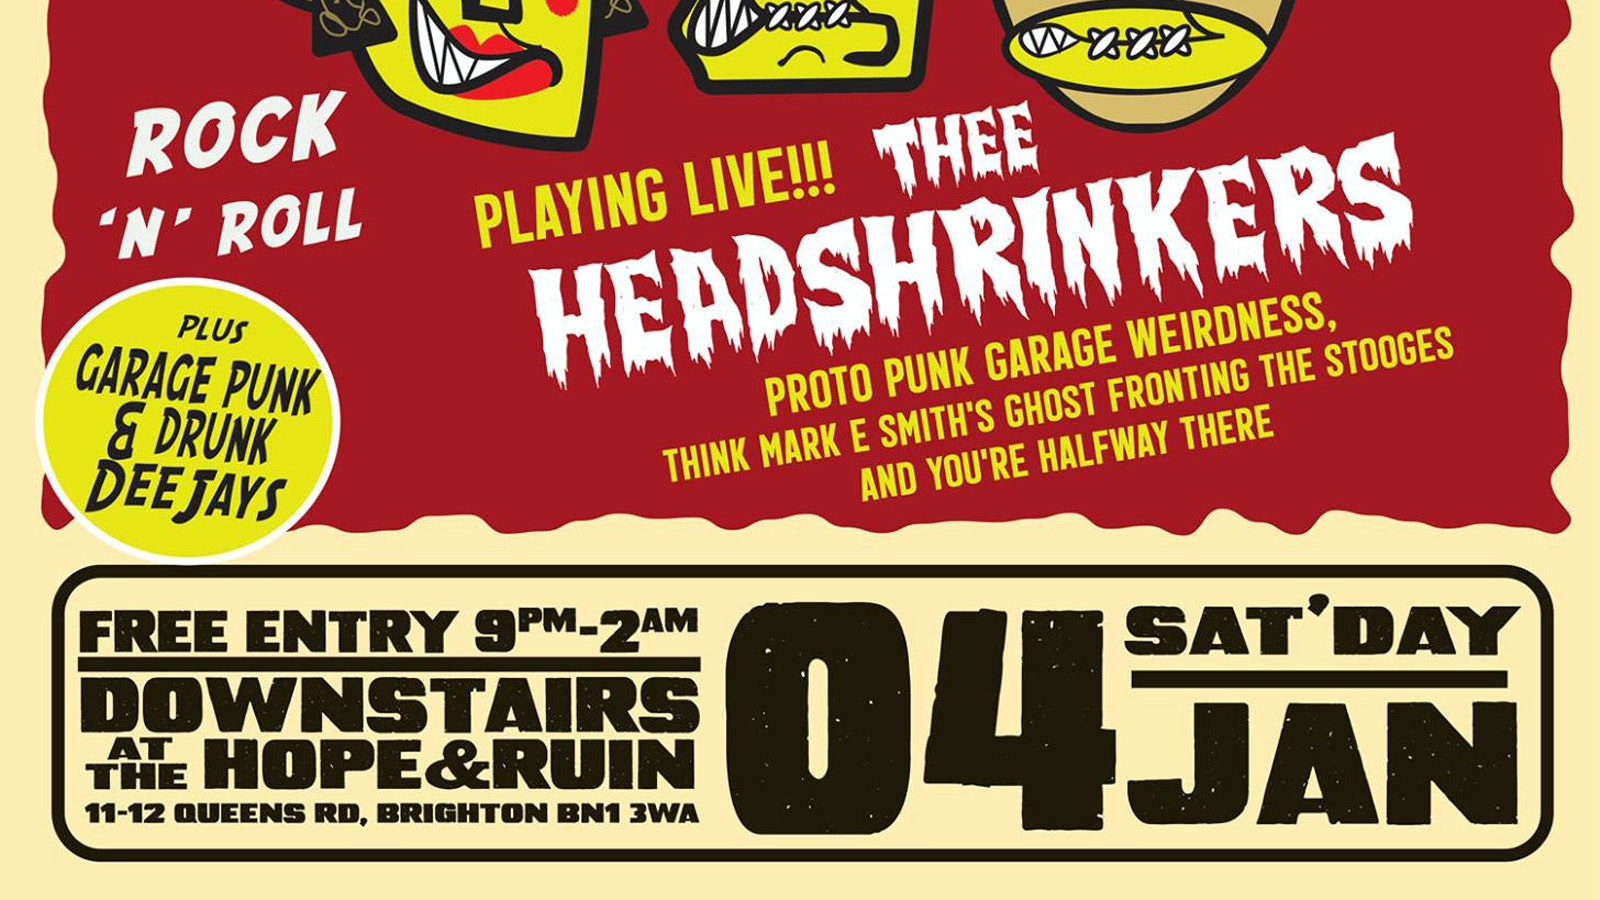 Stay Sick: Thee Headshrinkers (FREE)